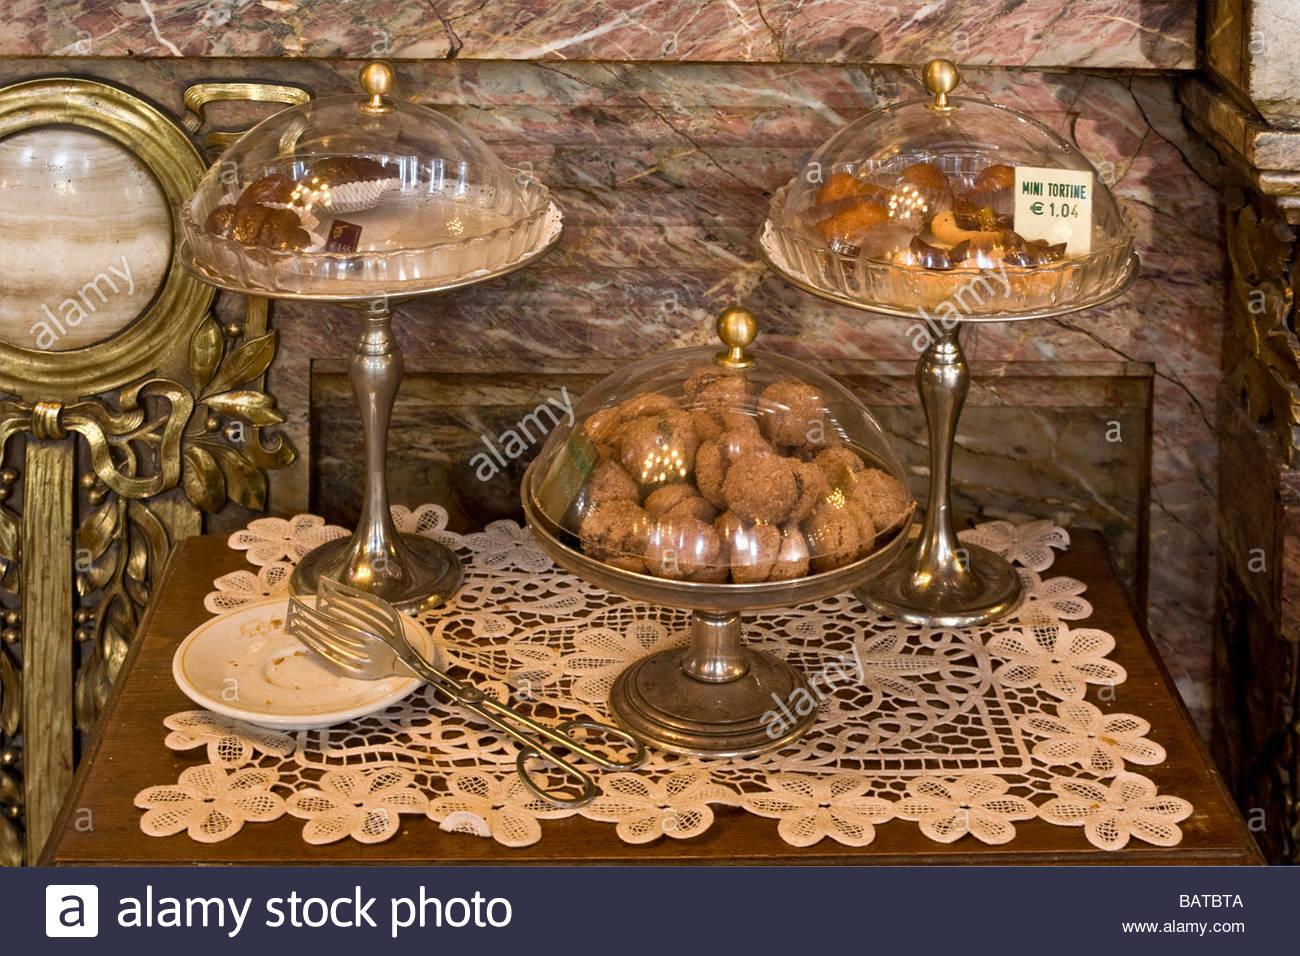 desserts  caff mulassano  turin  italy - Stock Image